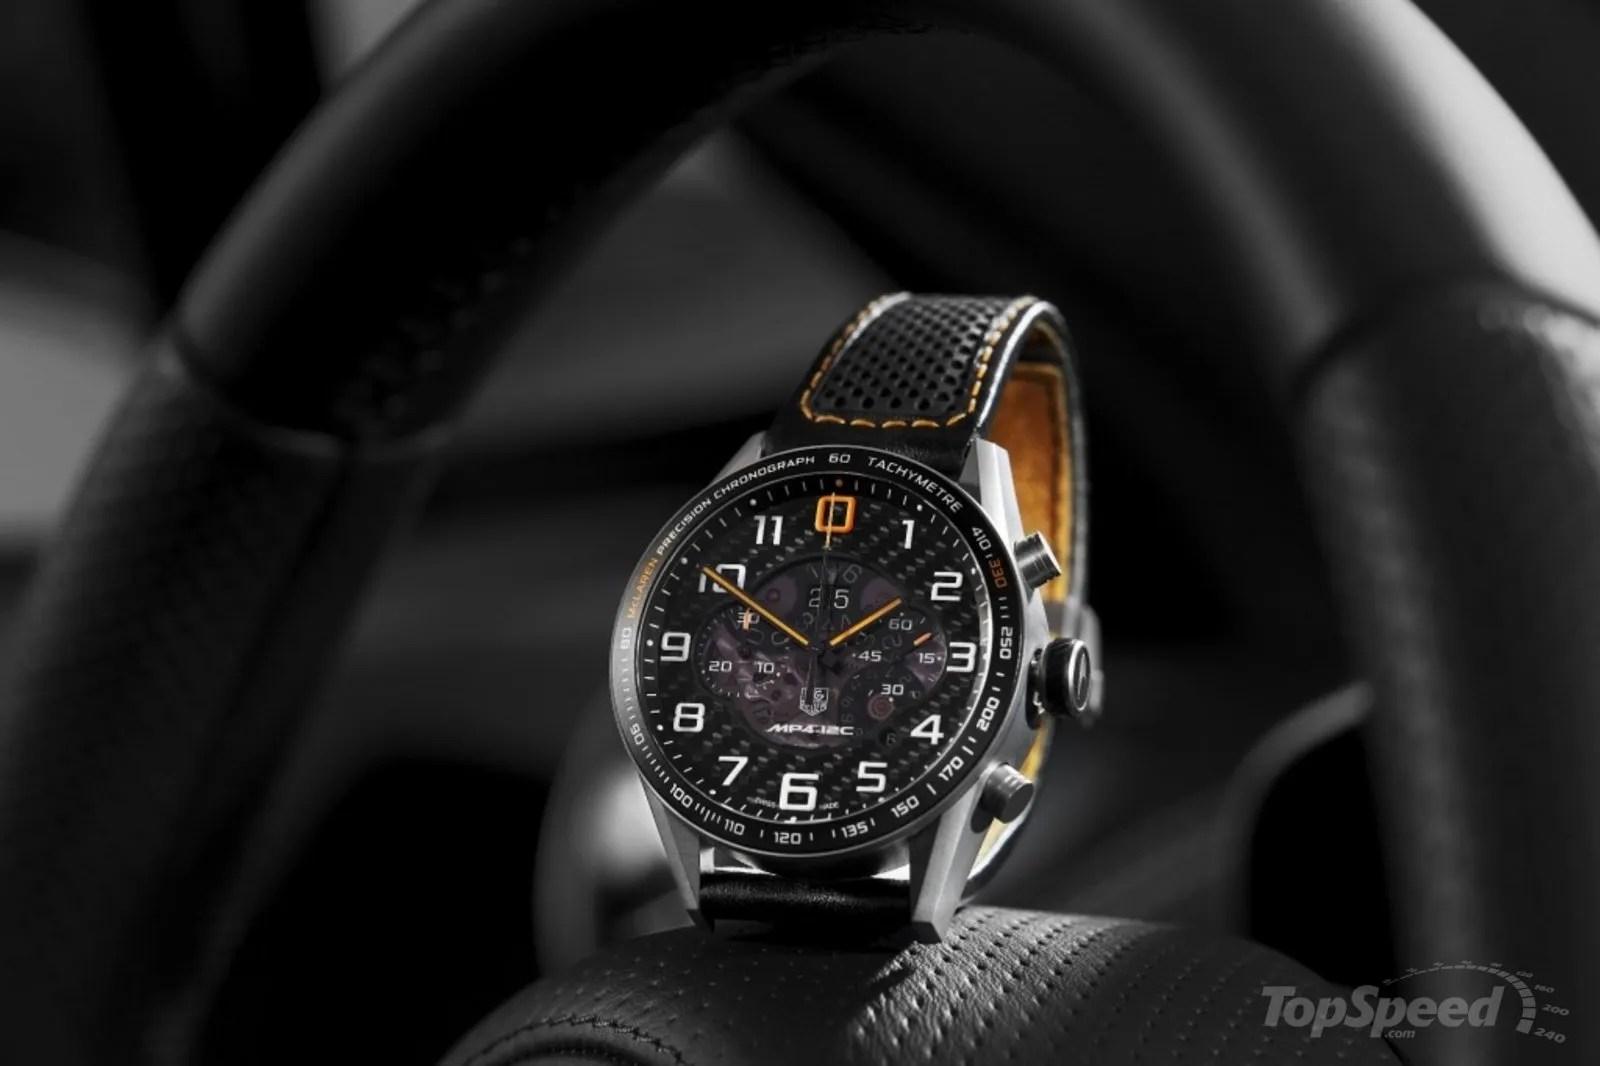 Tag Heuer Carrera MP4-12C Chronograph News